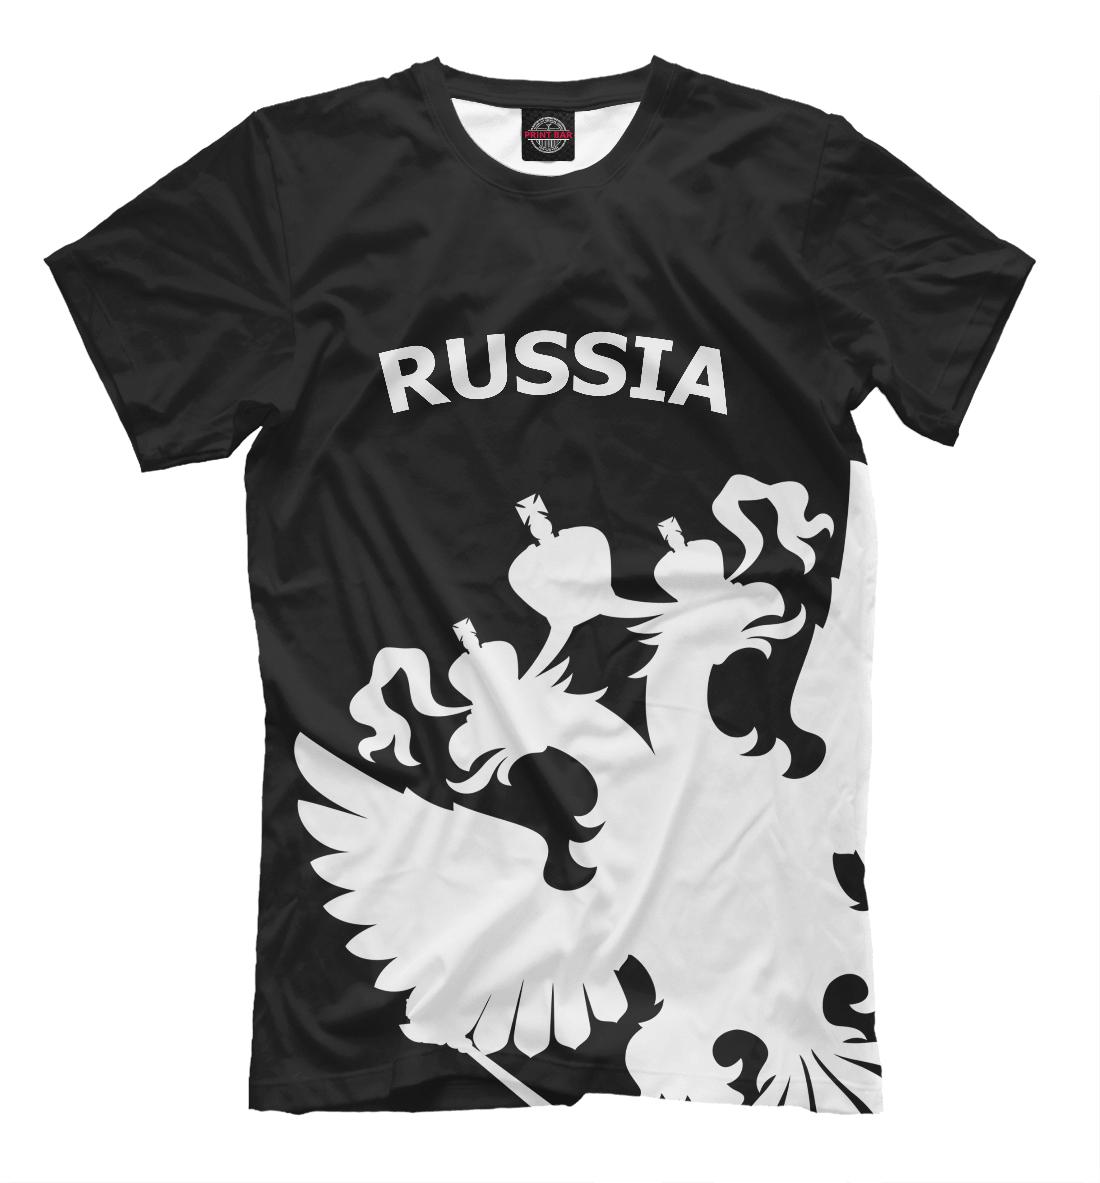 Купить Russia Black&White Collection, Printbar, Футболки, SRF-938797-fut-2